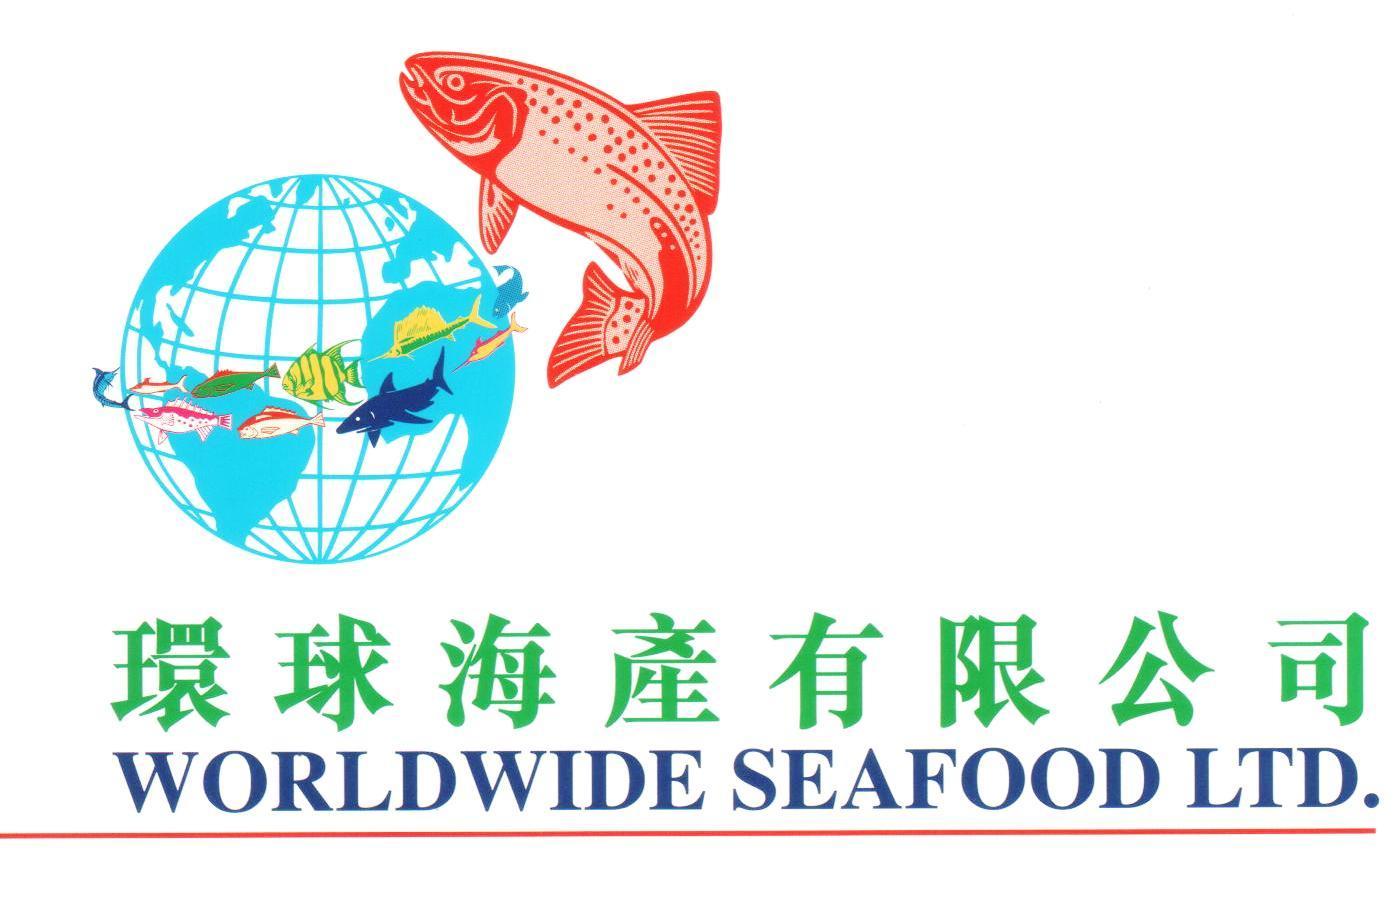 Worldwide Seafood Limited